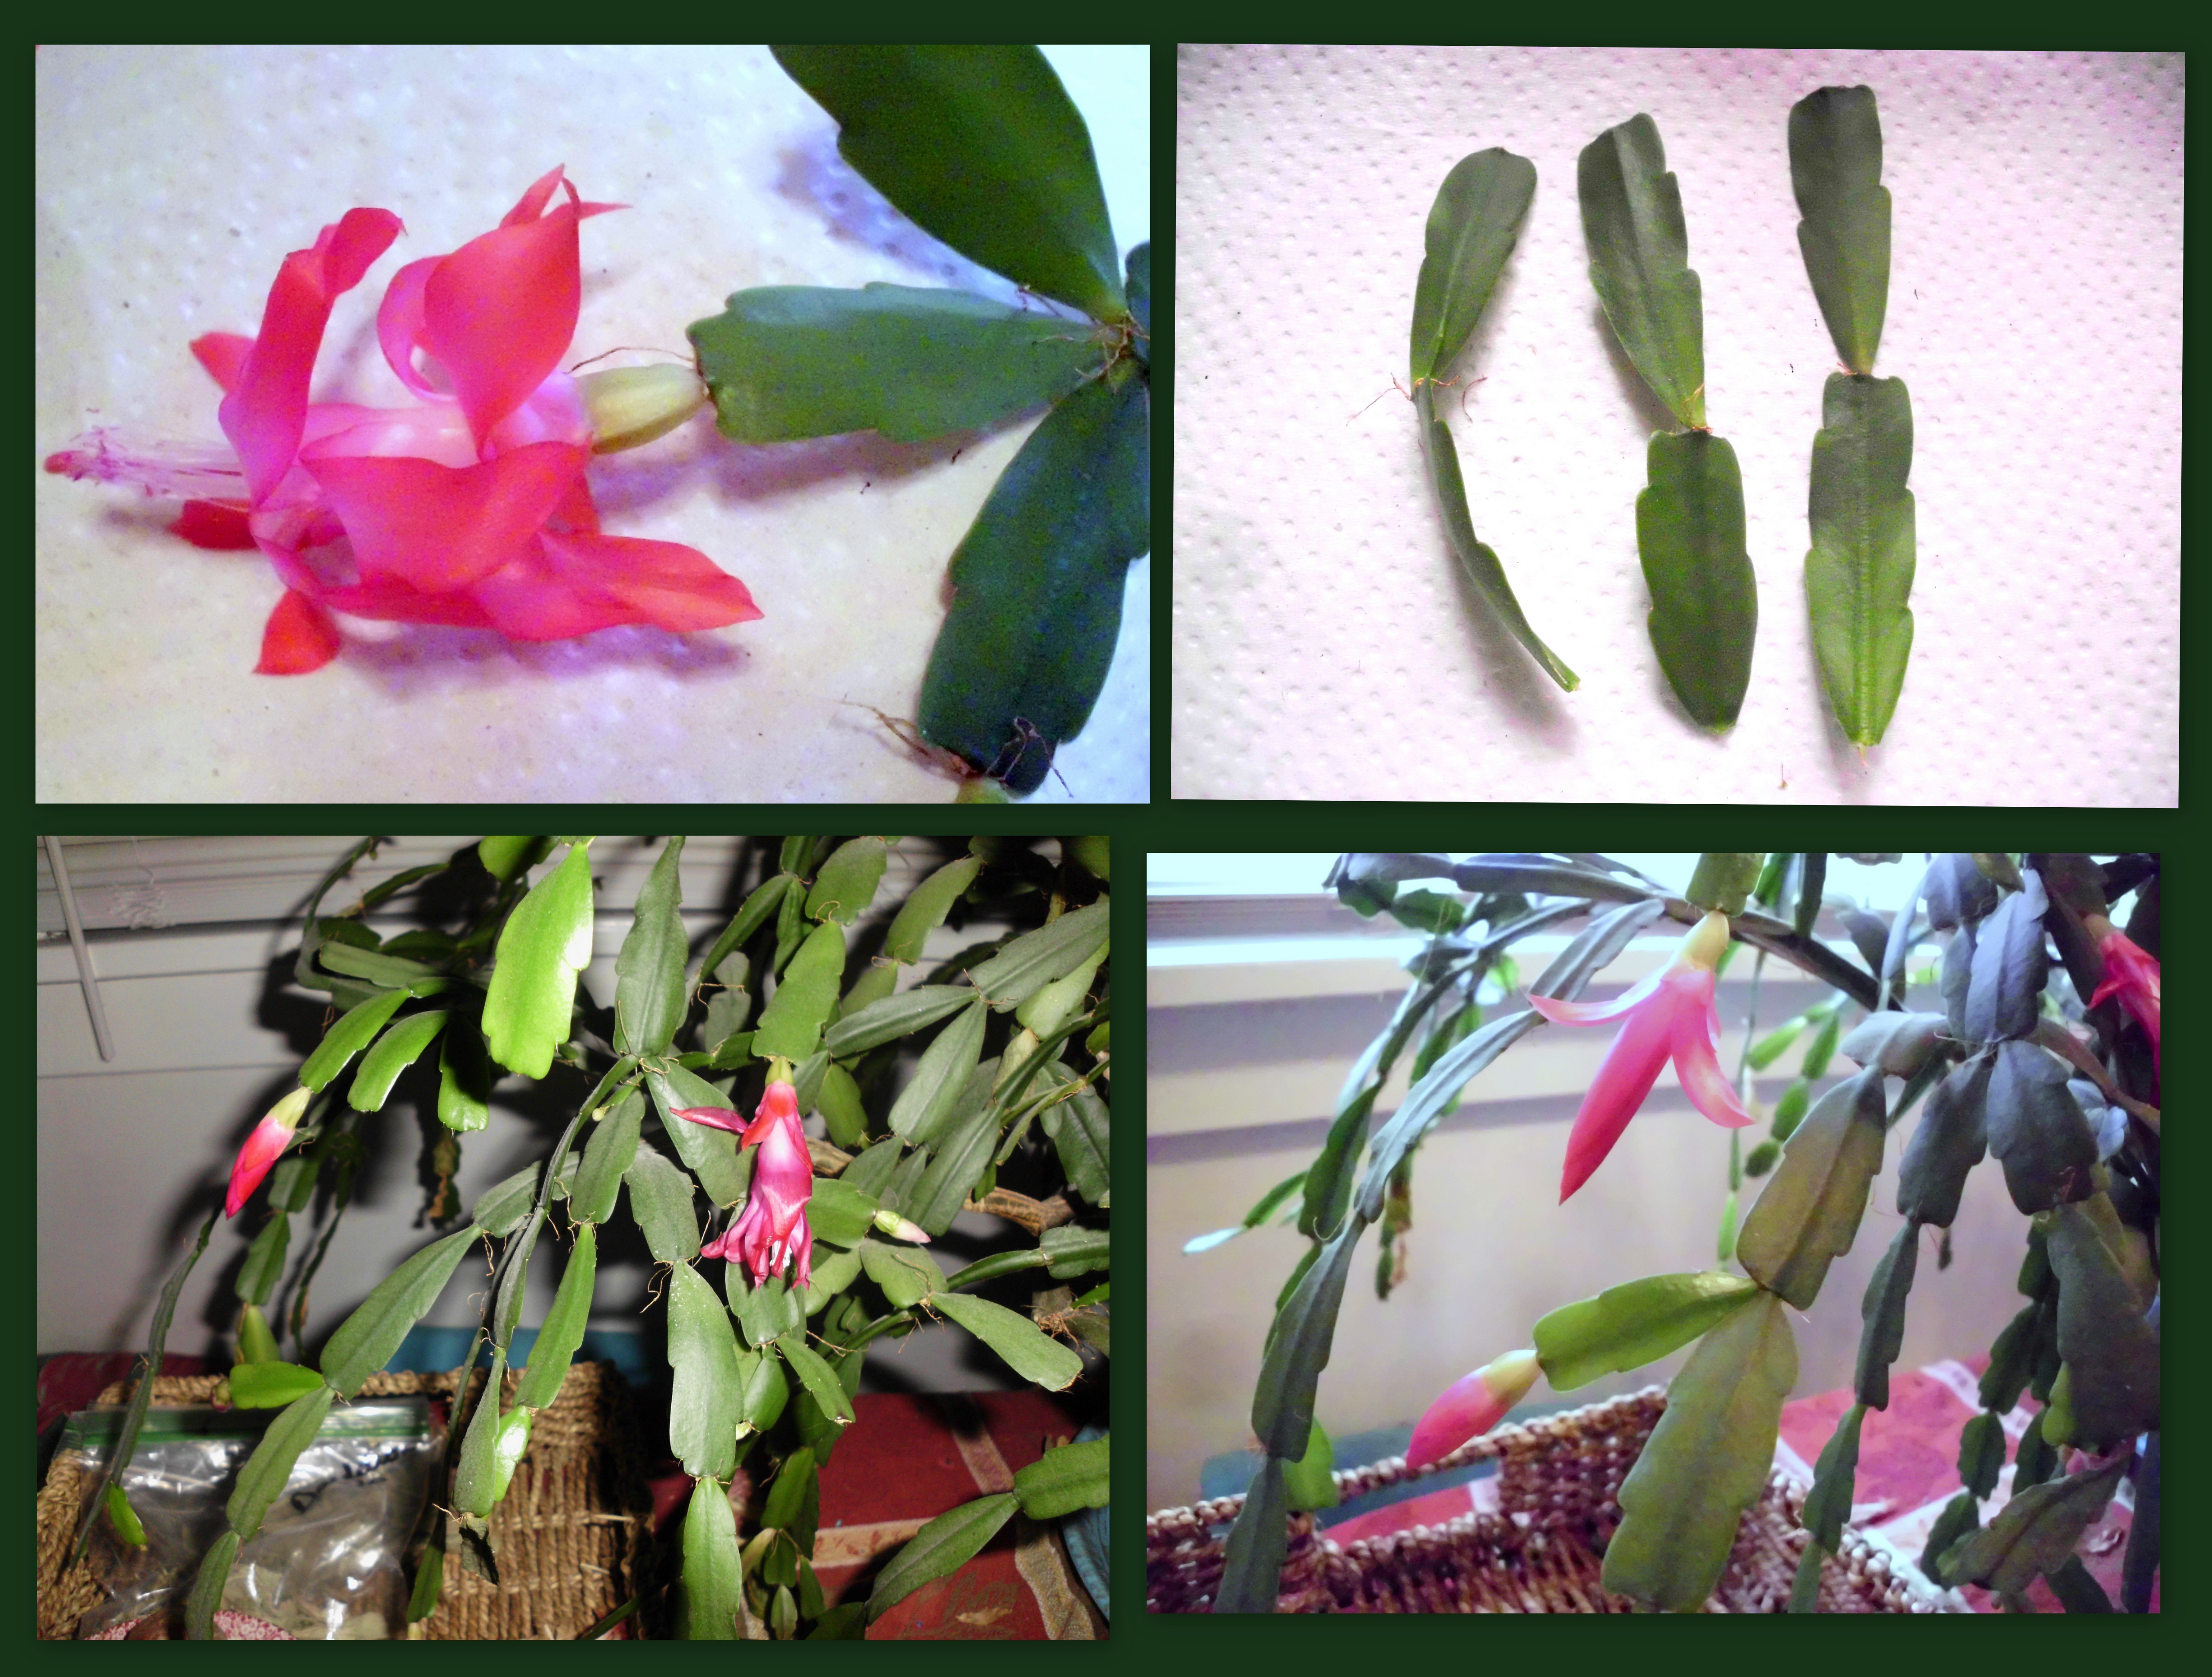 reddish-pink-christmas-cactus